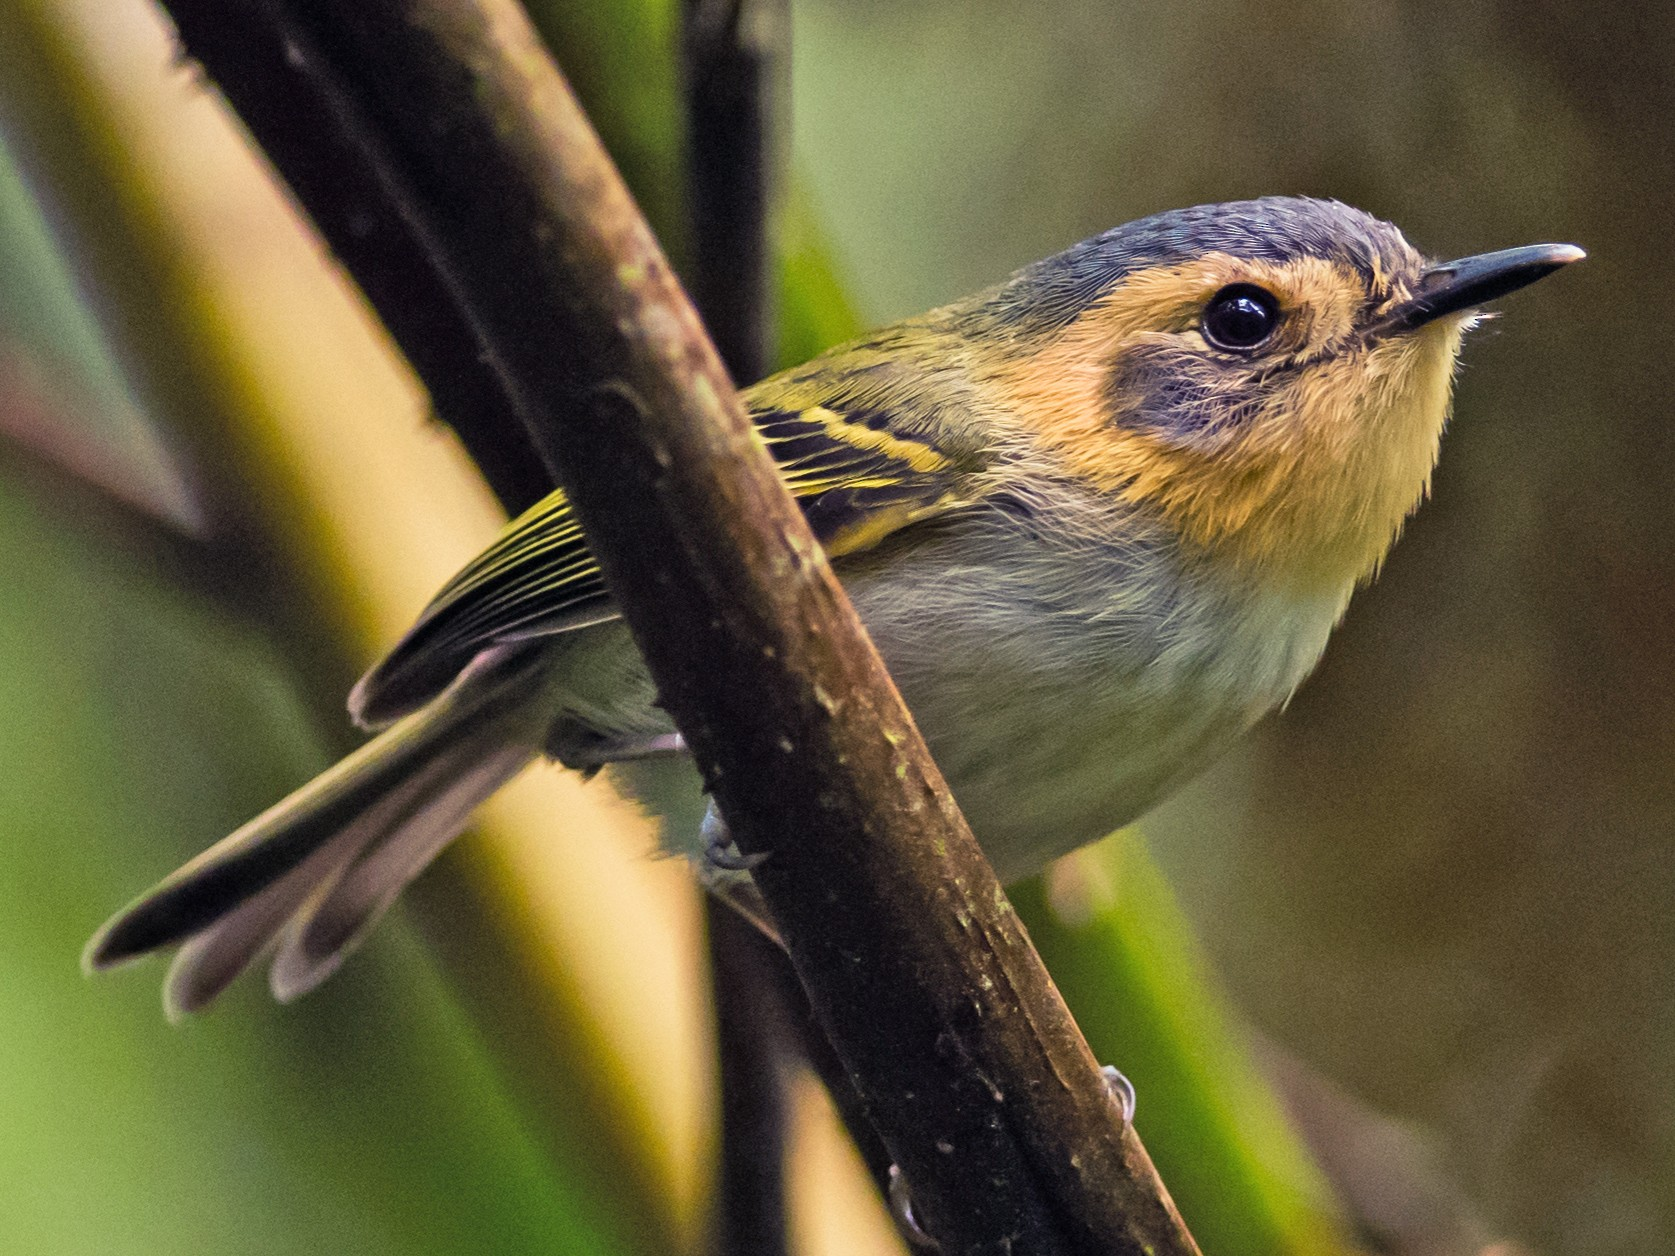 Ochre-faced Tody-Flycatcher - Claudia Brasileiro